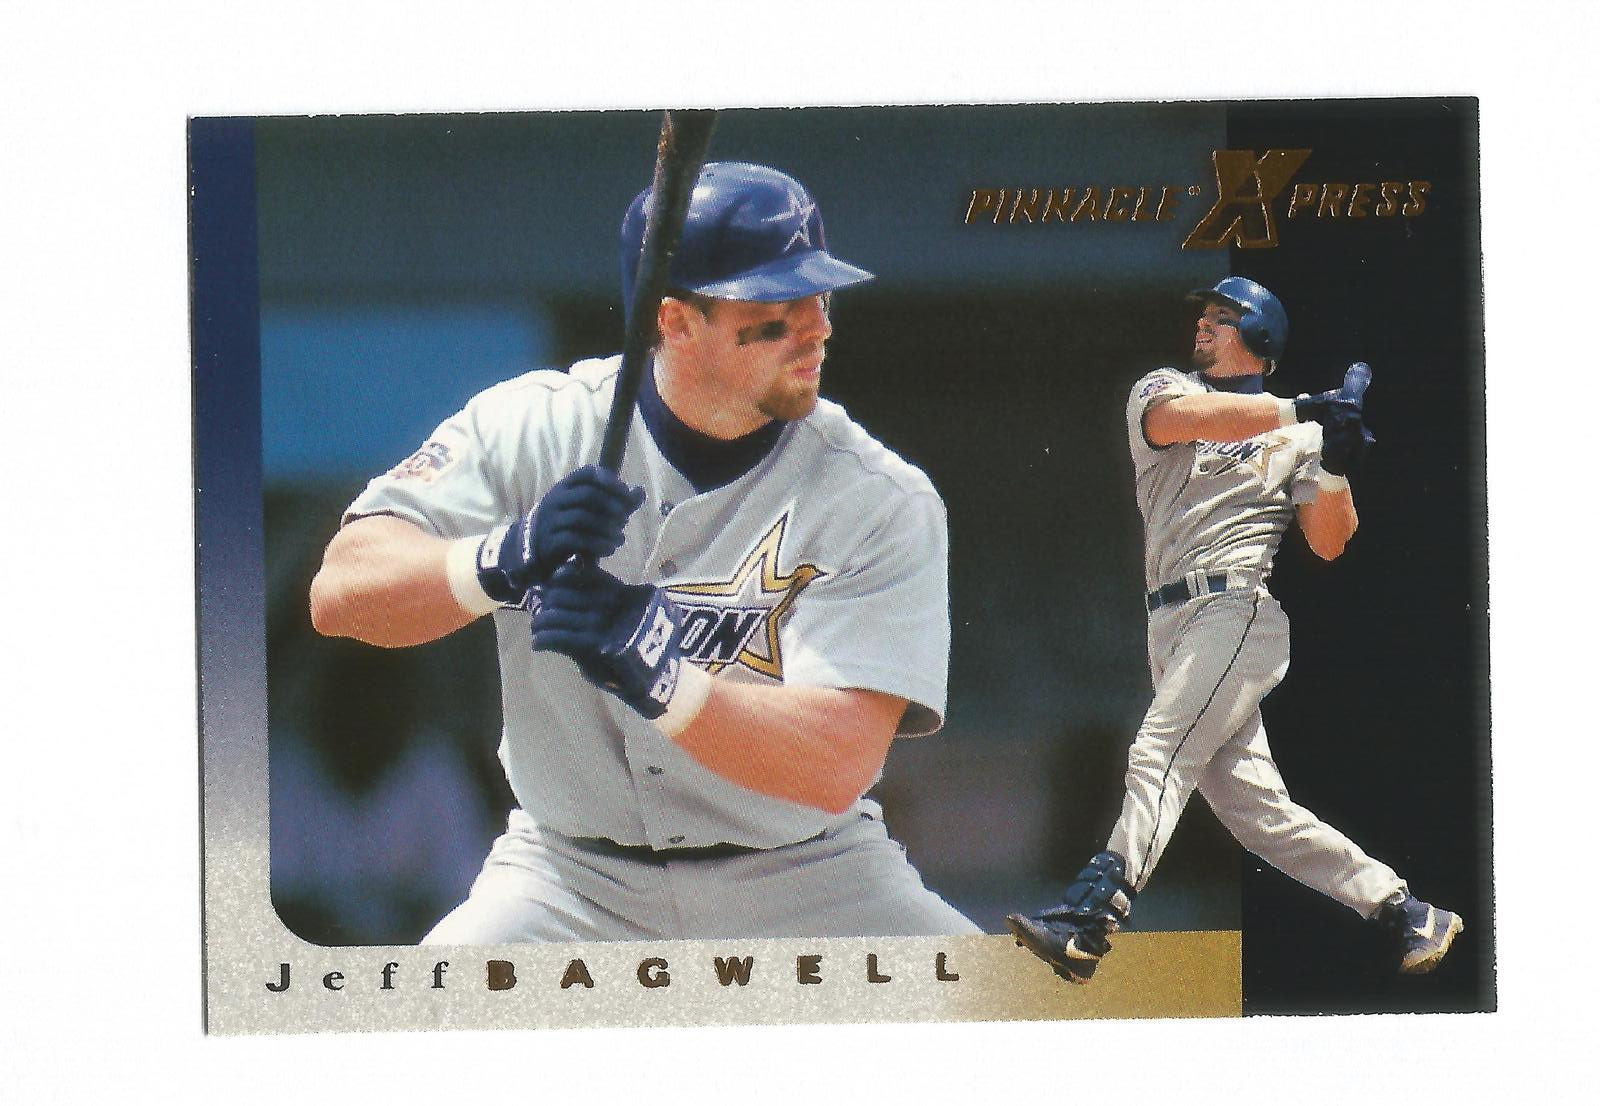 Jeff Bagwell 1997 Pinnacle Xpress Card #78 Houston Astros Free Shipping